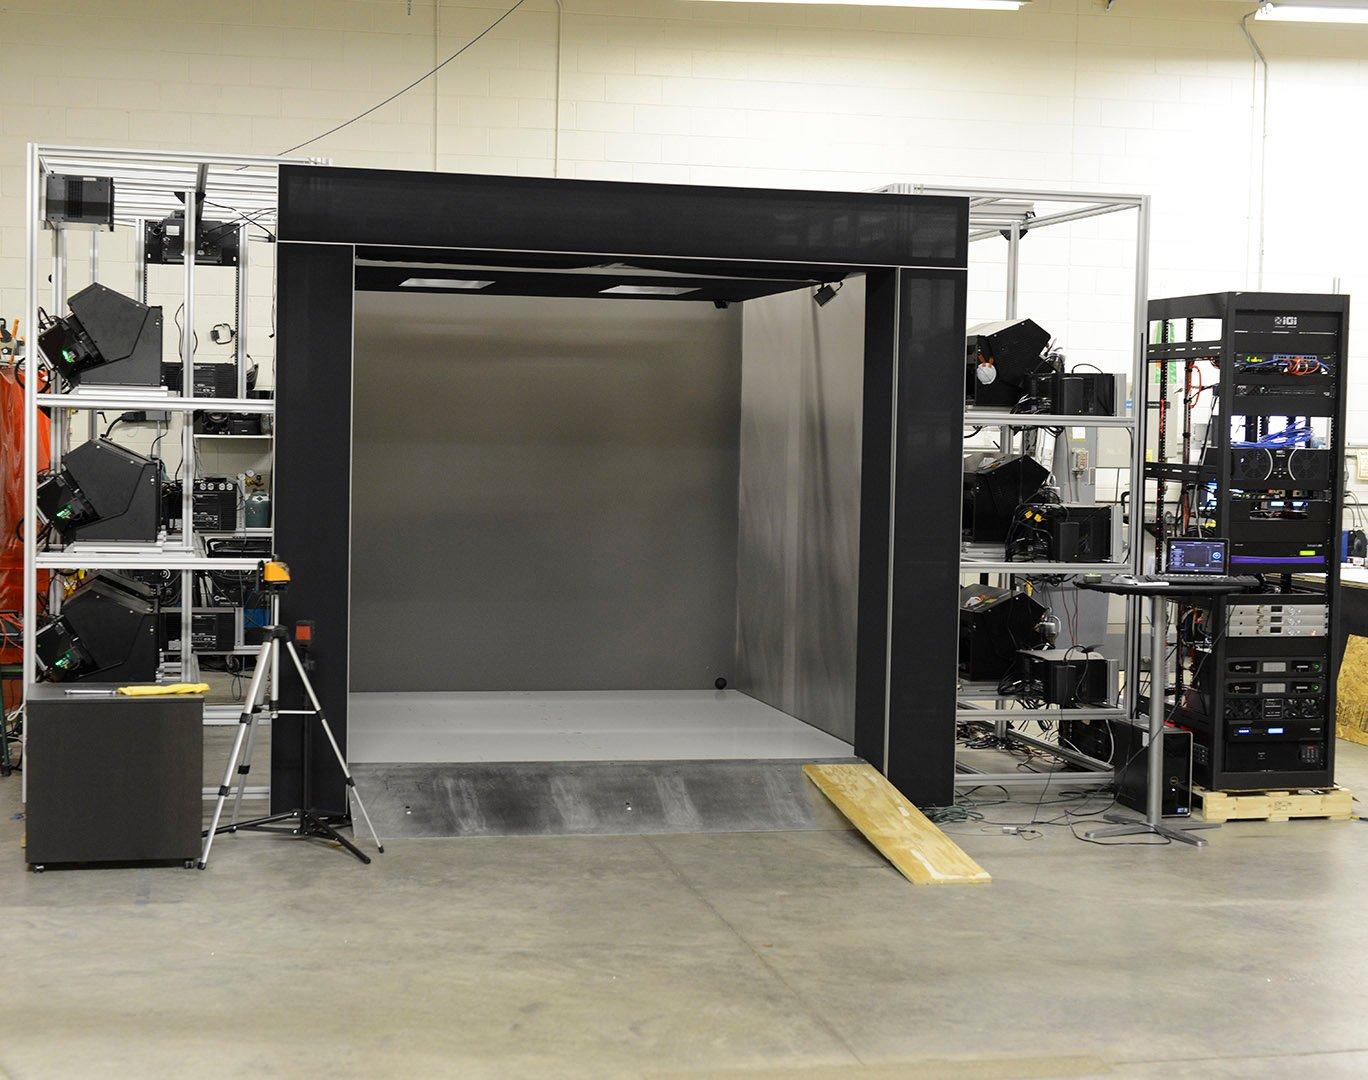 IGI cave virtual reality custom installation system fabrication